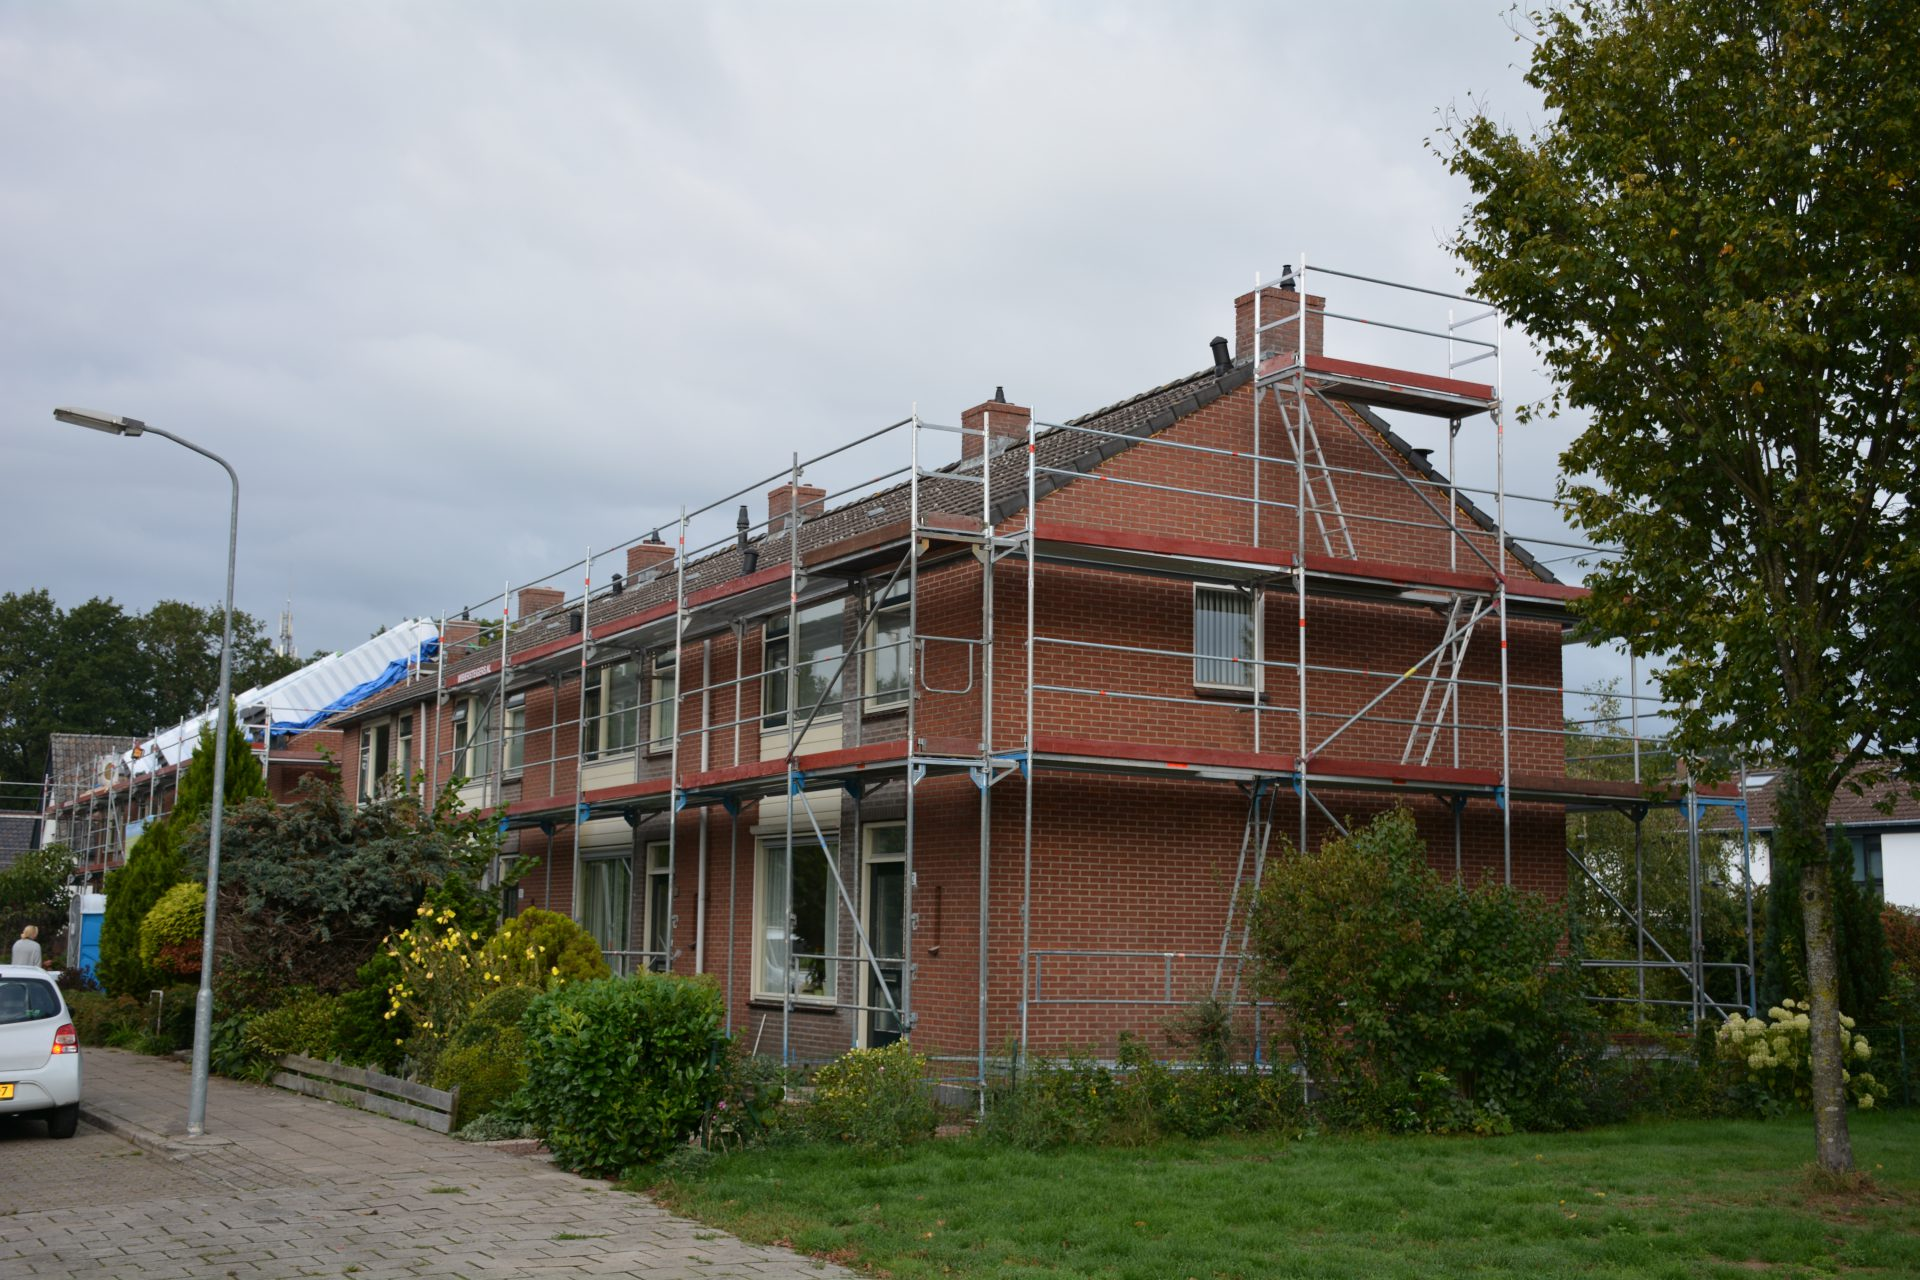 Woningbouw stijgerwerk 2